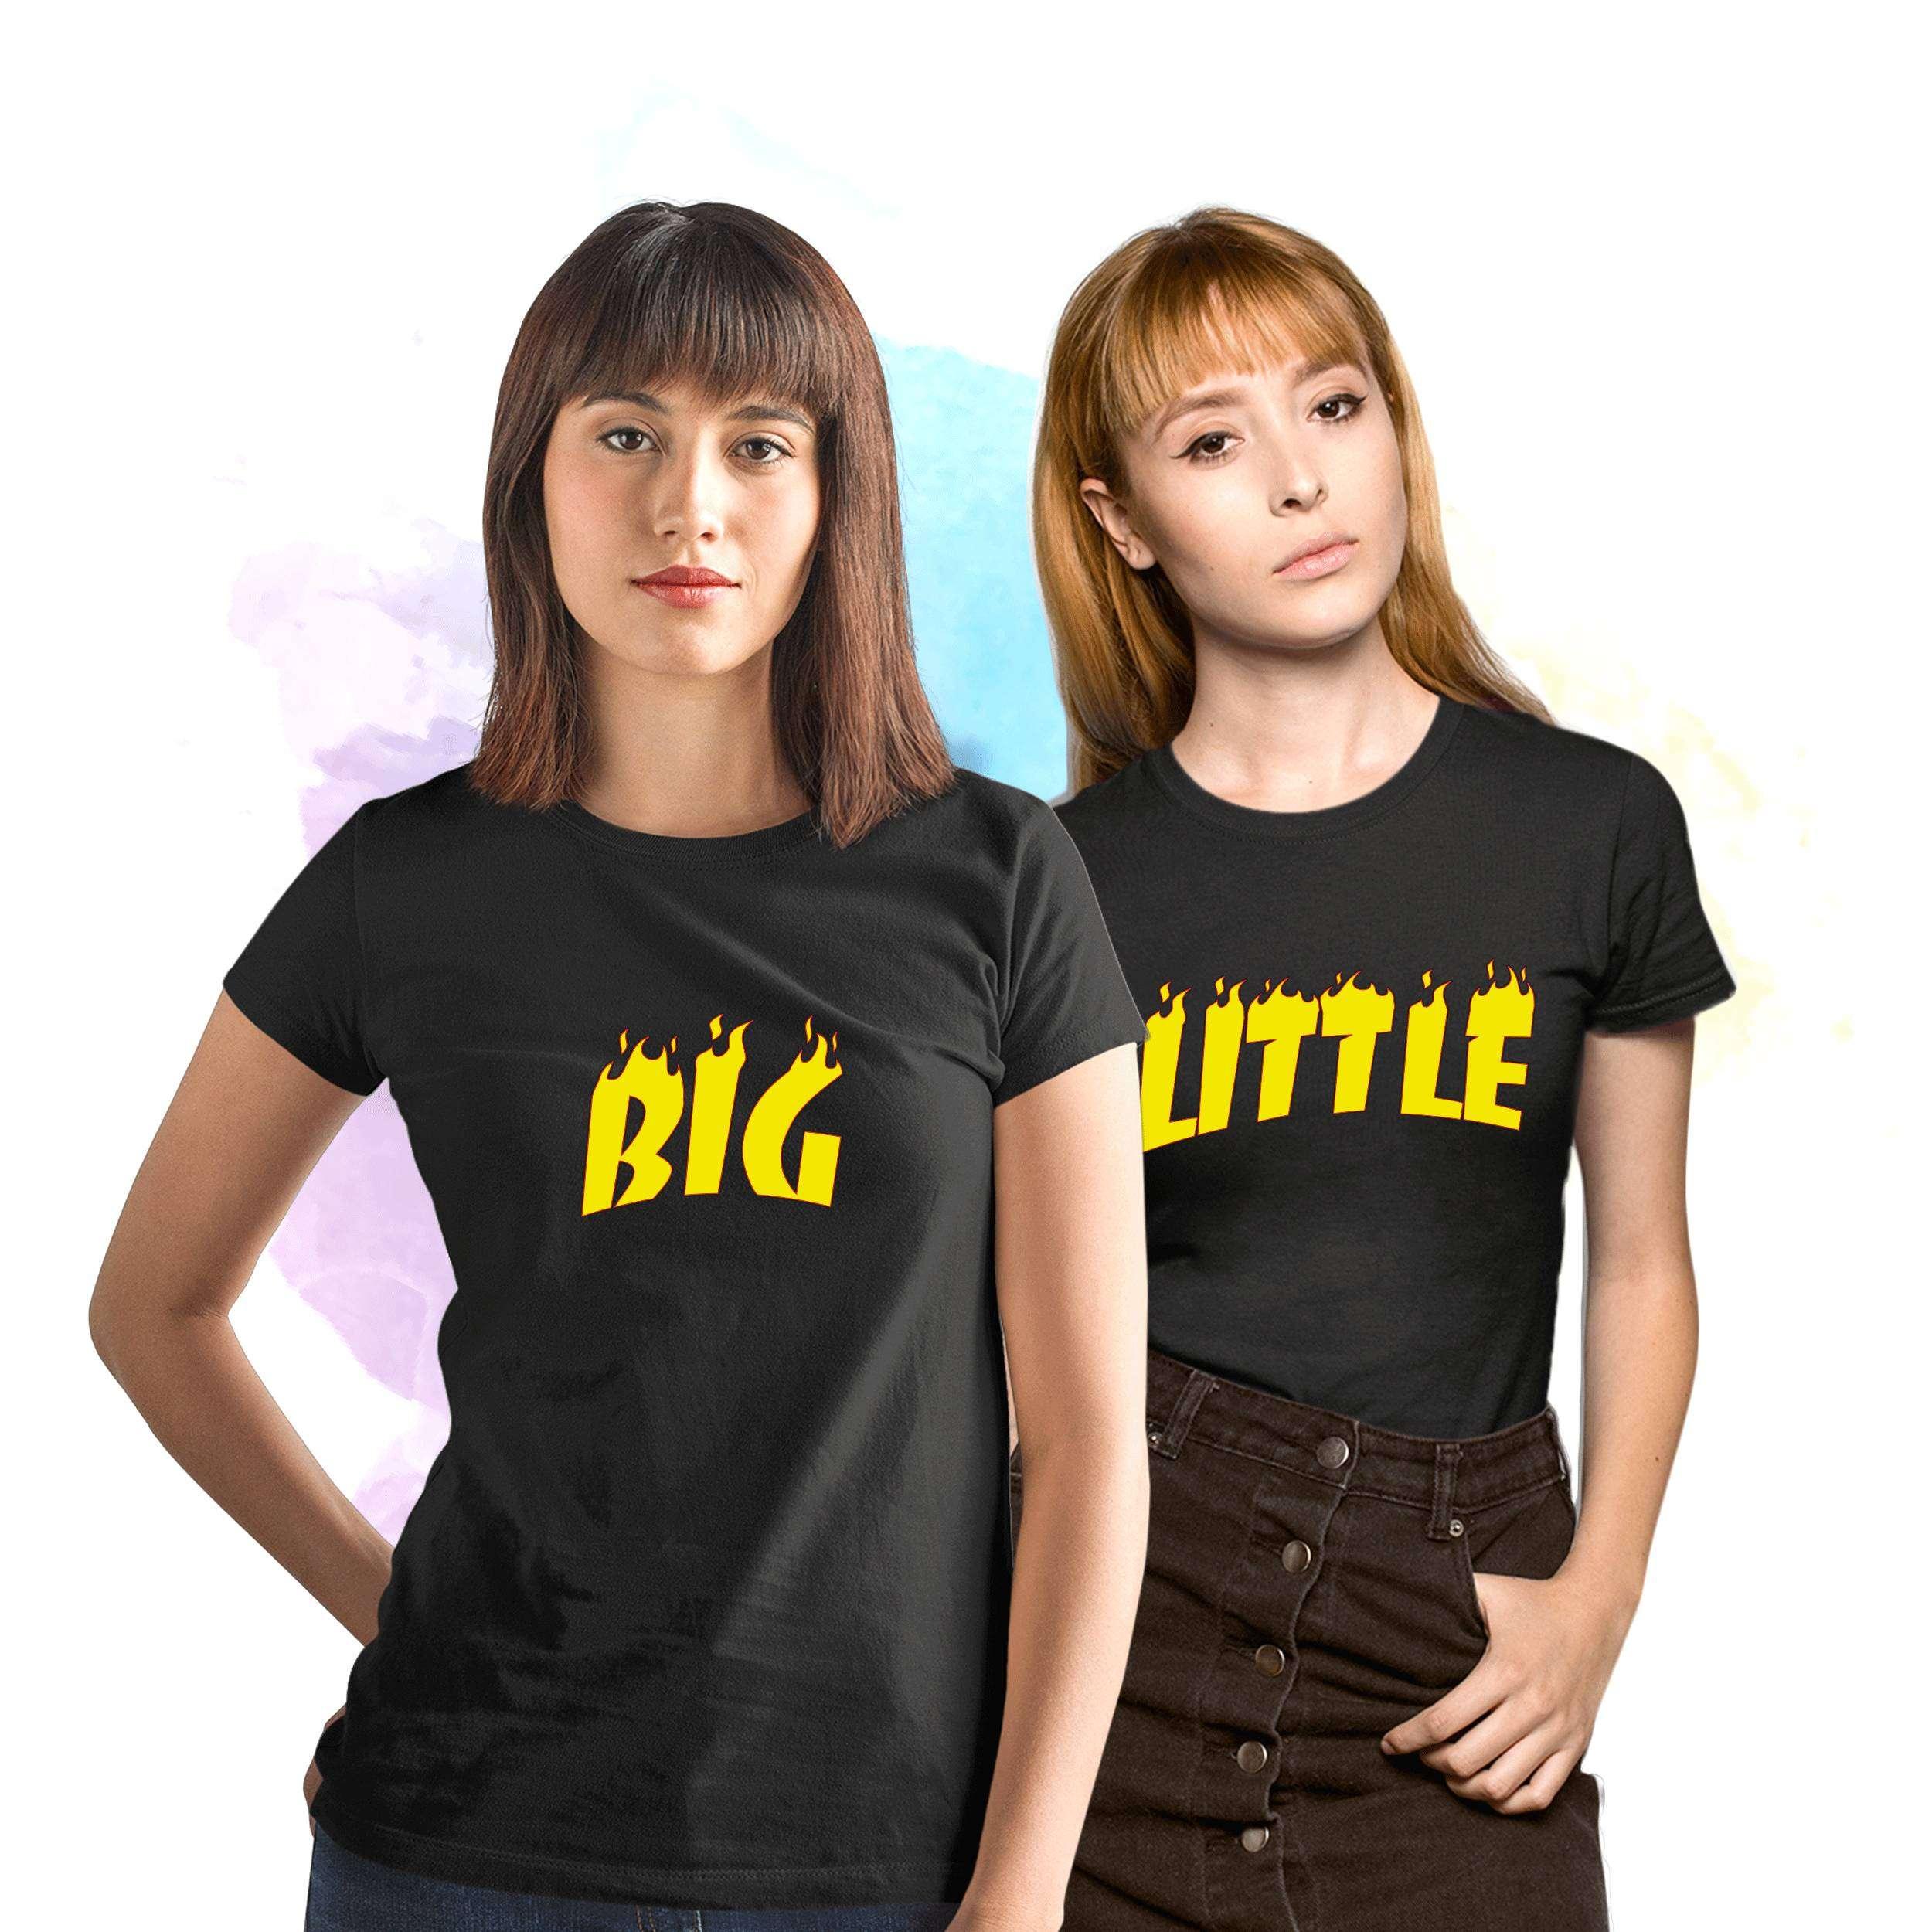 eae26110f Matching Big Little Shirts, Sorority Shirts, Trasher, Best Friends Shirts